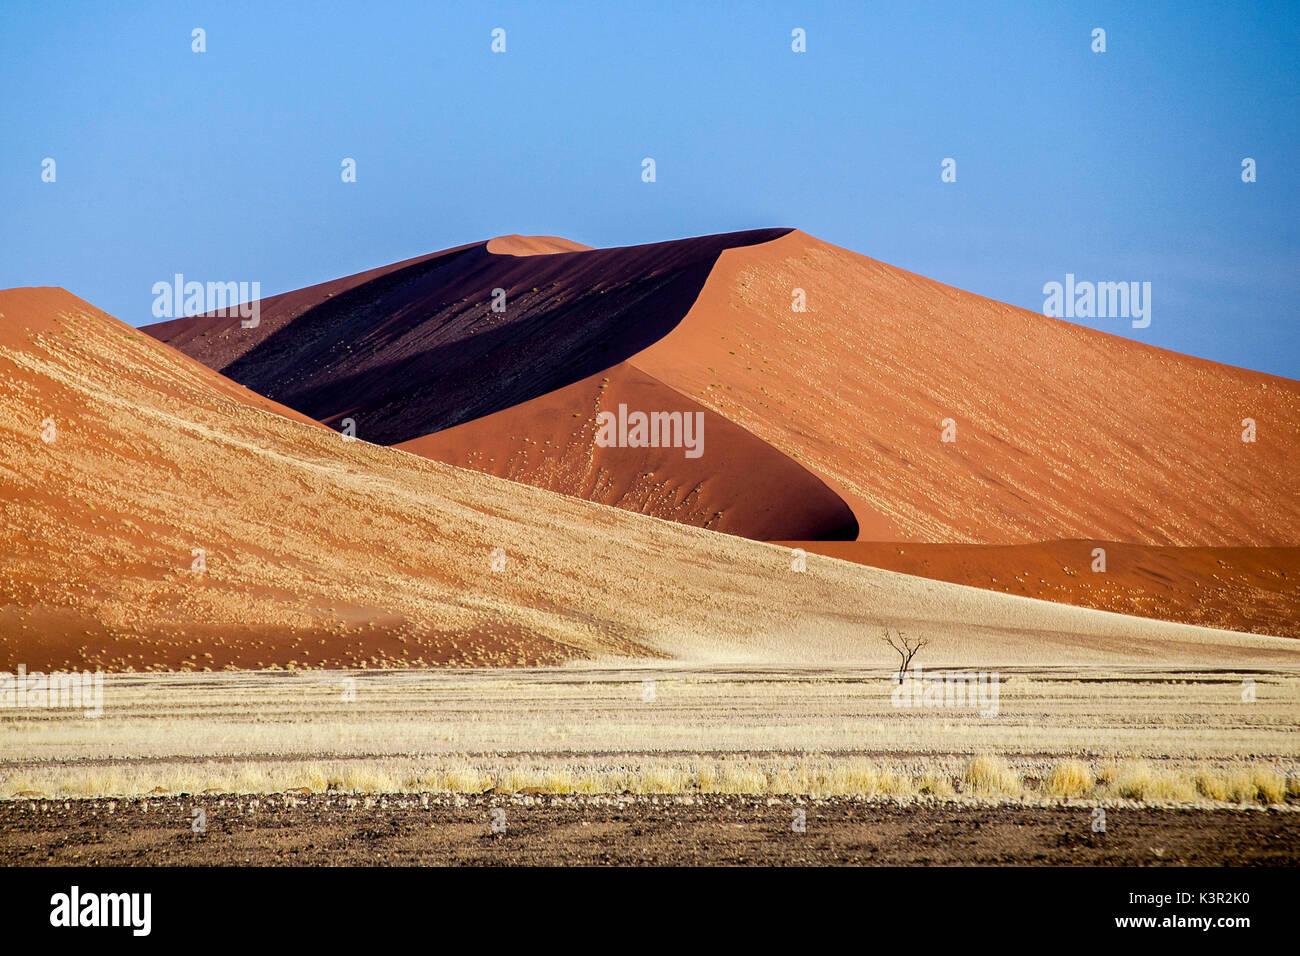 Dried plants among the sand dunes shaped by wind Deadvlei Sossusvlei Namib Desert Naukluft National Park Namibia Africa - Stock Image